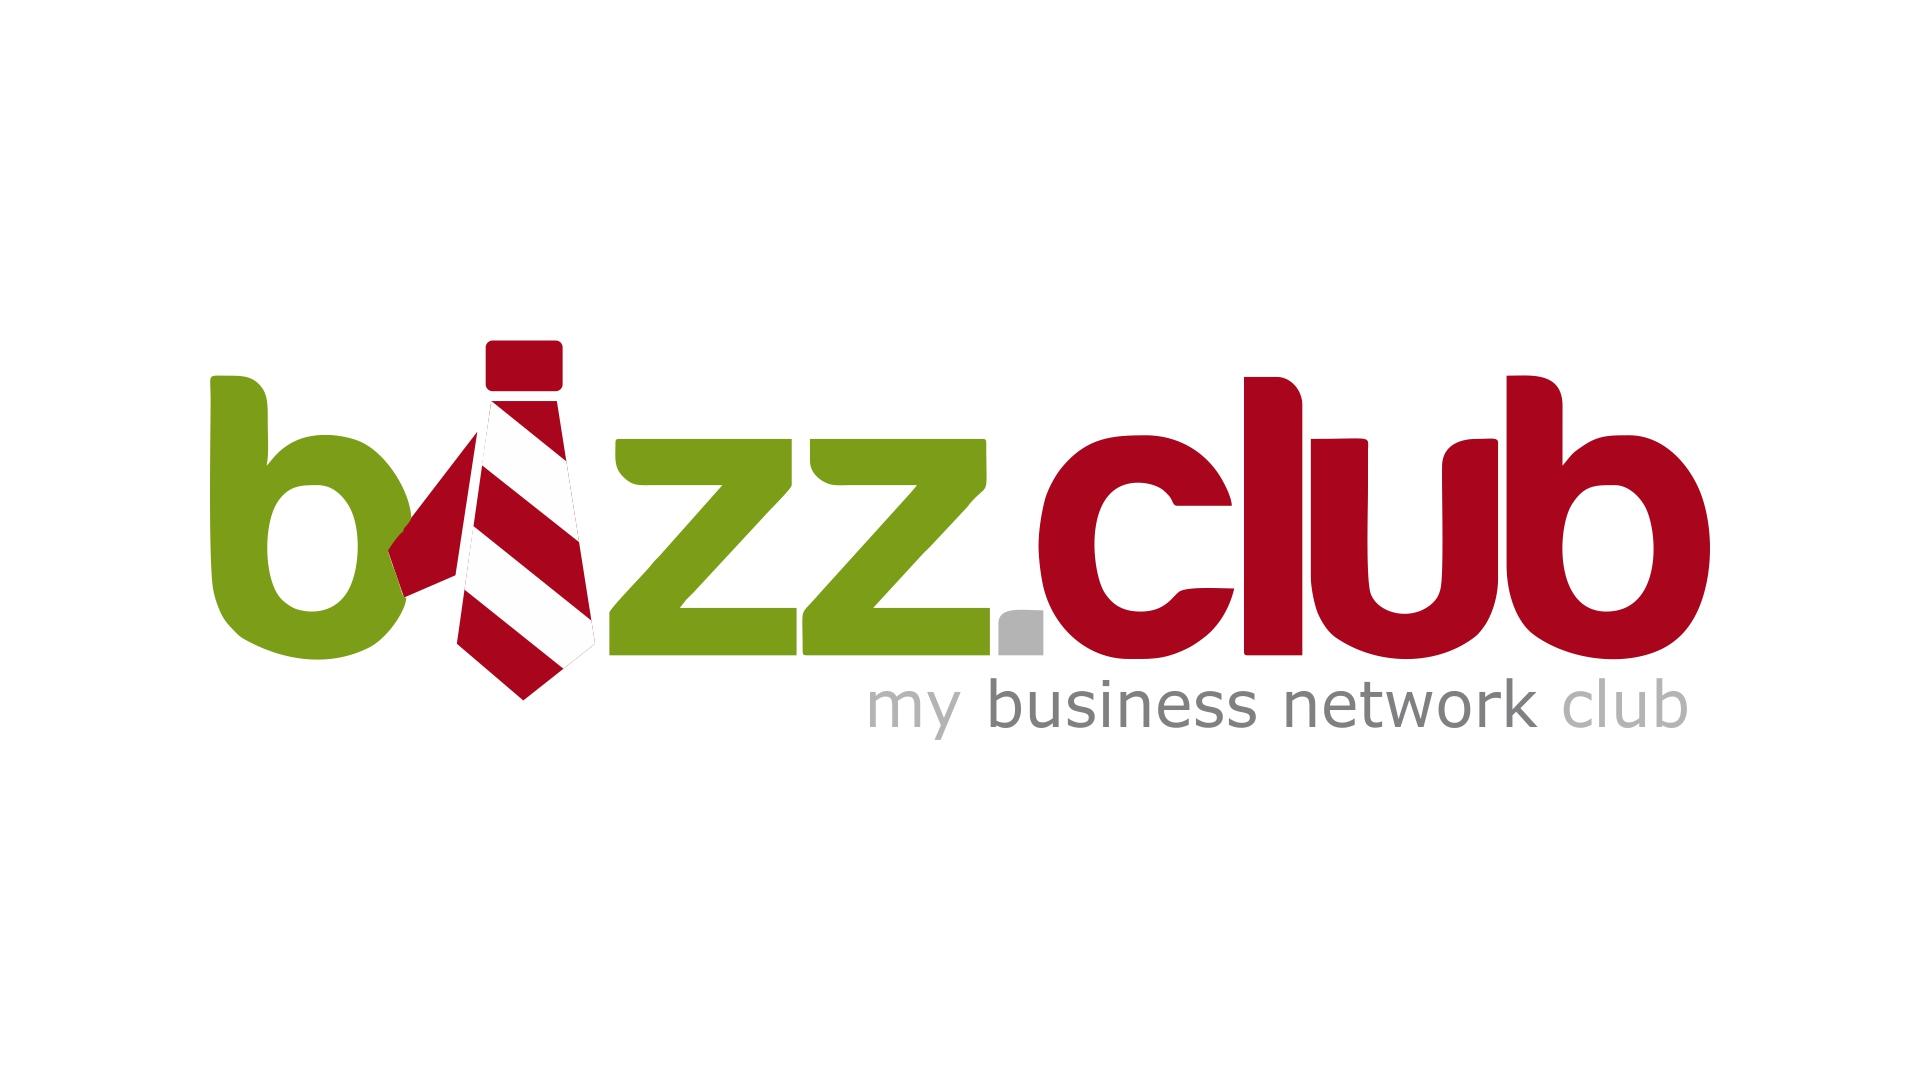 logo vechi bizz club